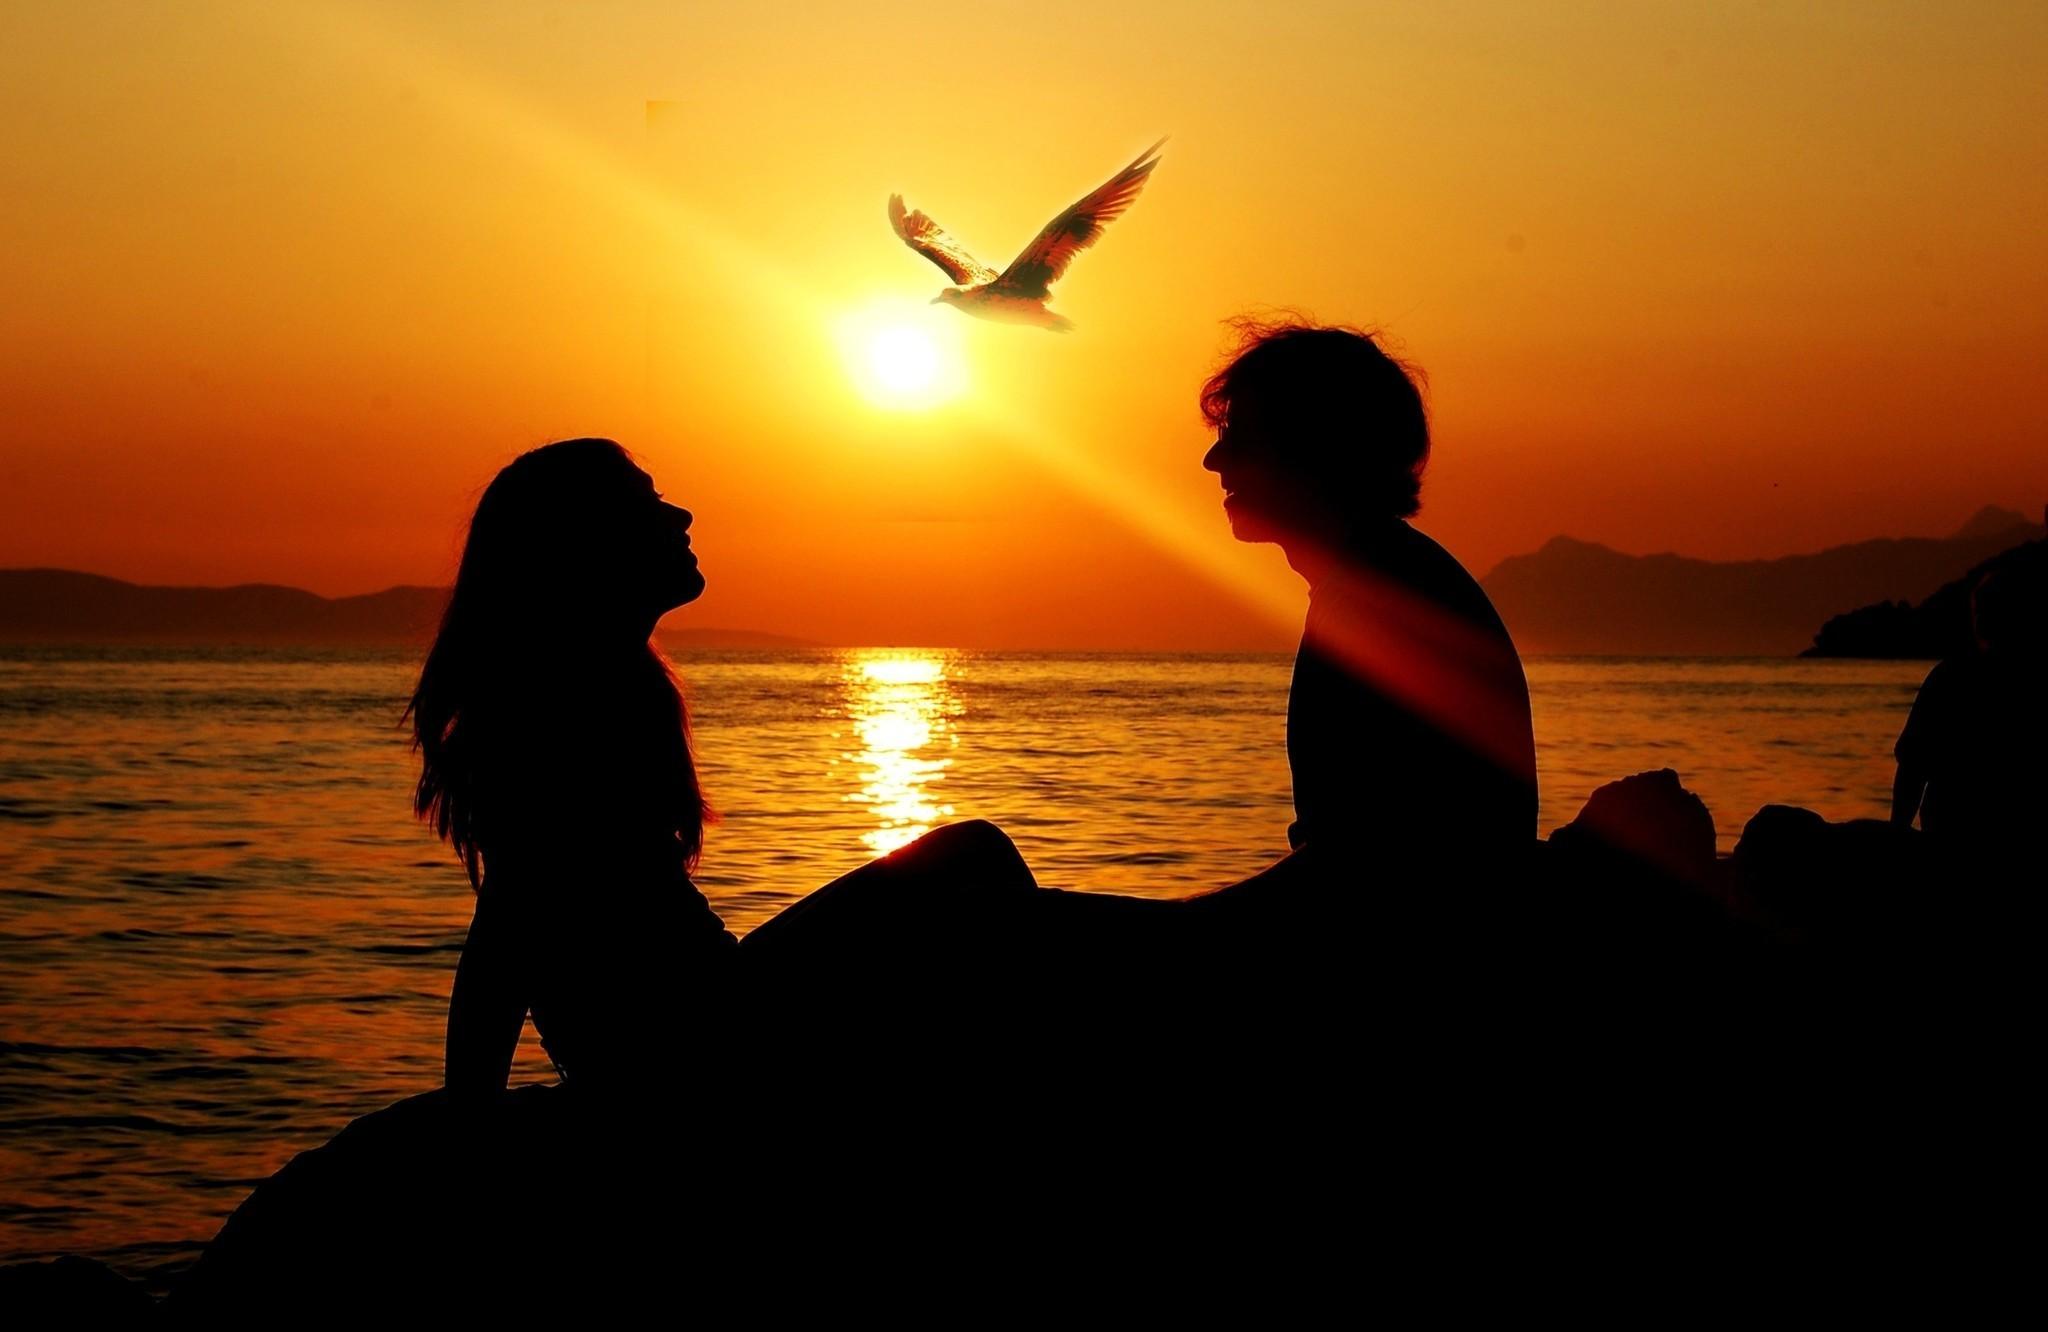 Картинка: Девушка, парень, силуэт, море, закат, солнце, вечер, чайка, горизонт, романтика